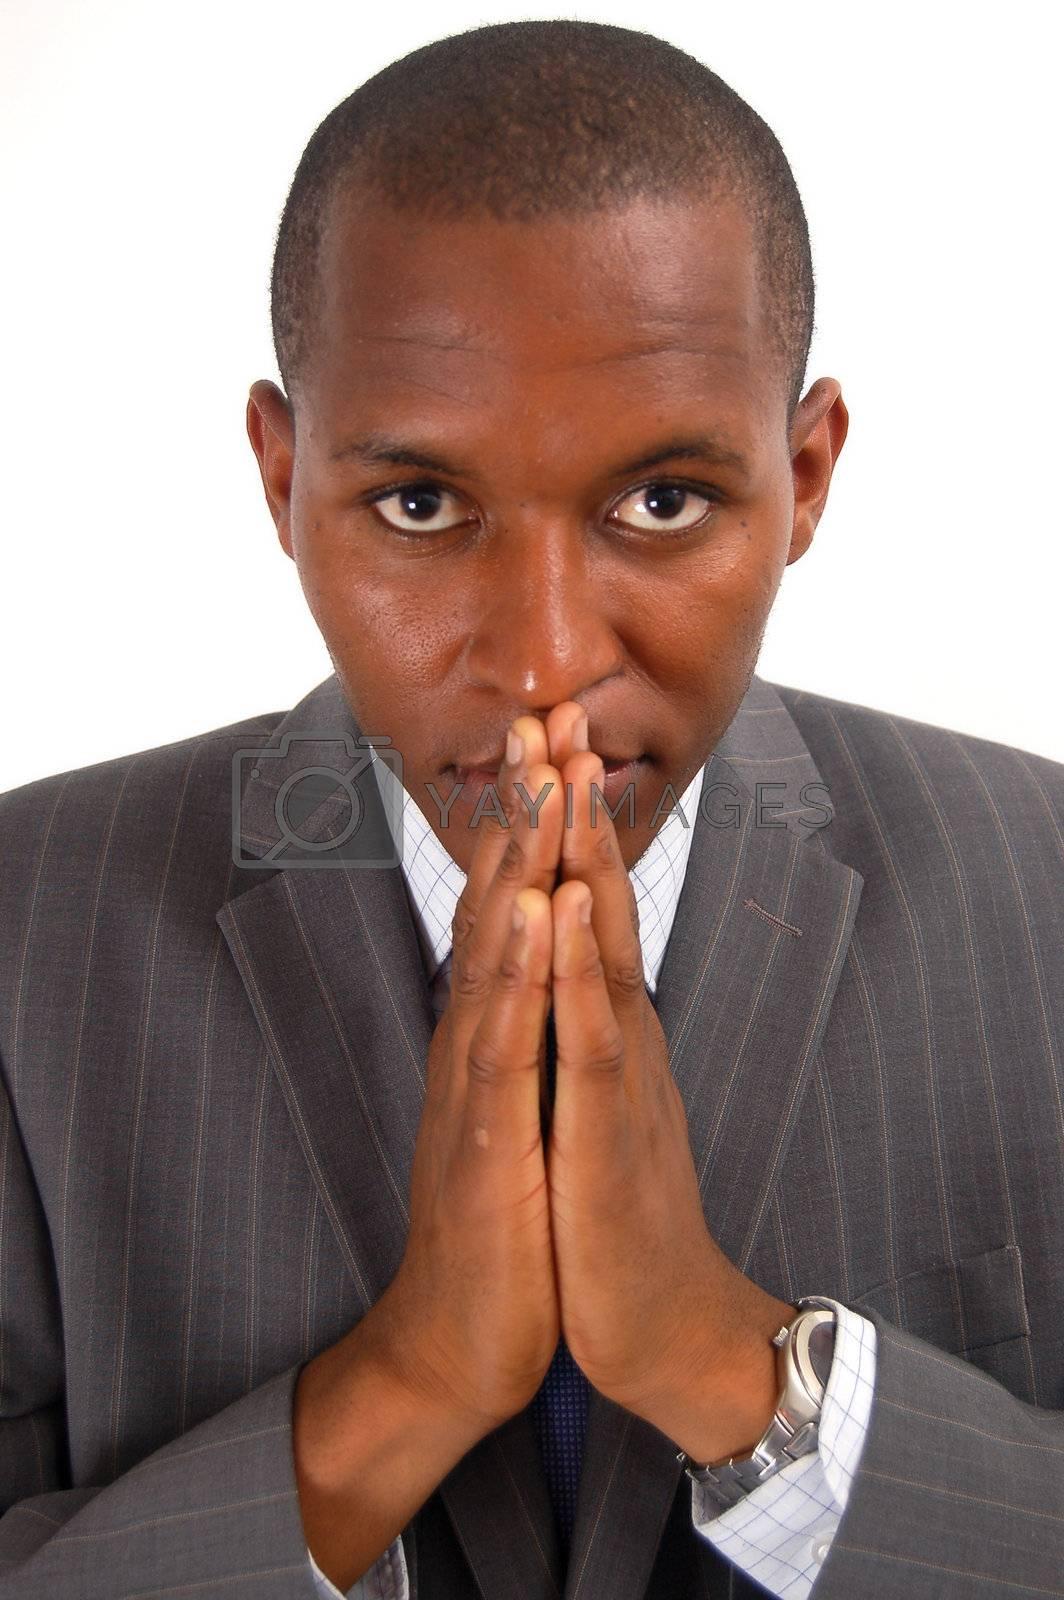 Royalty free image of Prayerful Man by Imabase